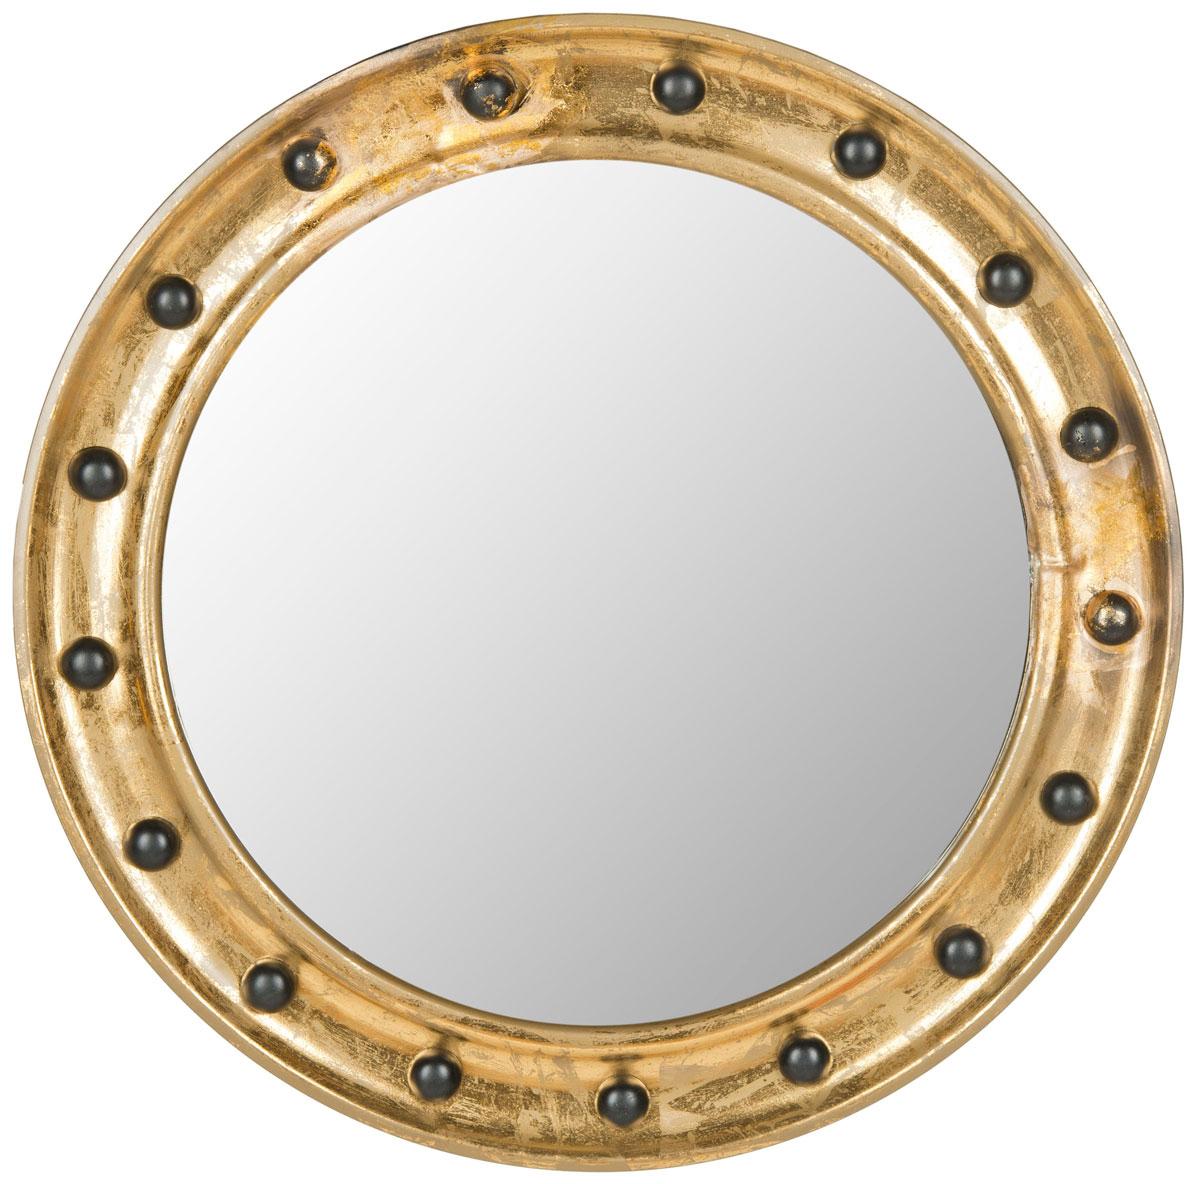 safavieh mirror.jpg